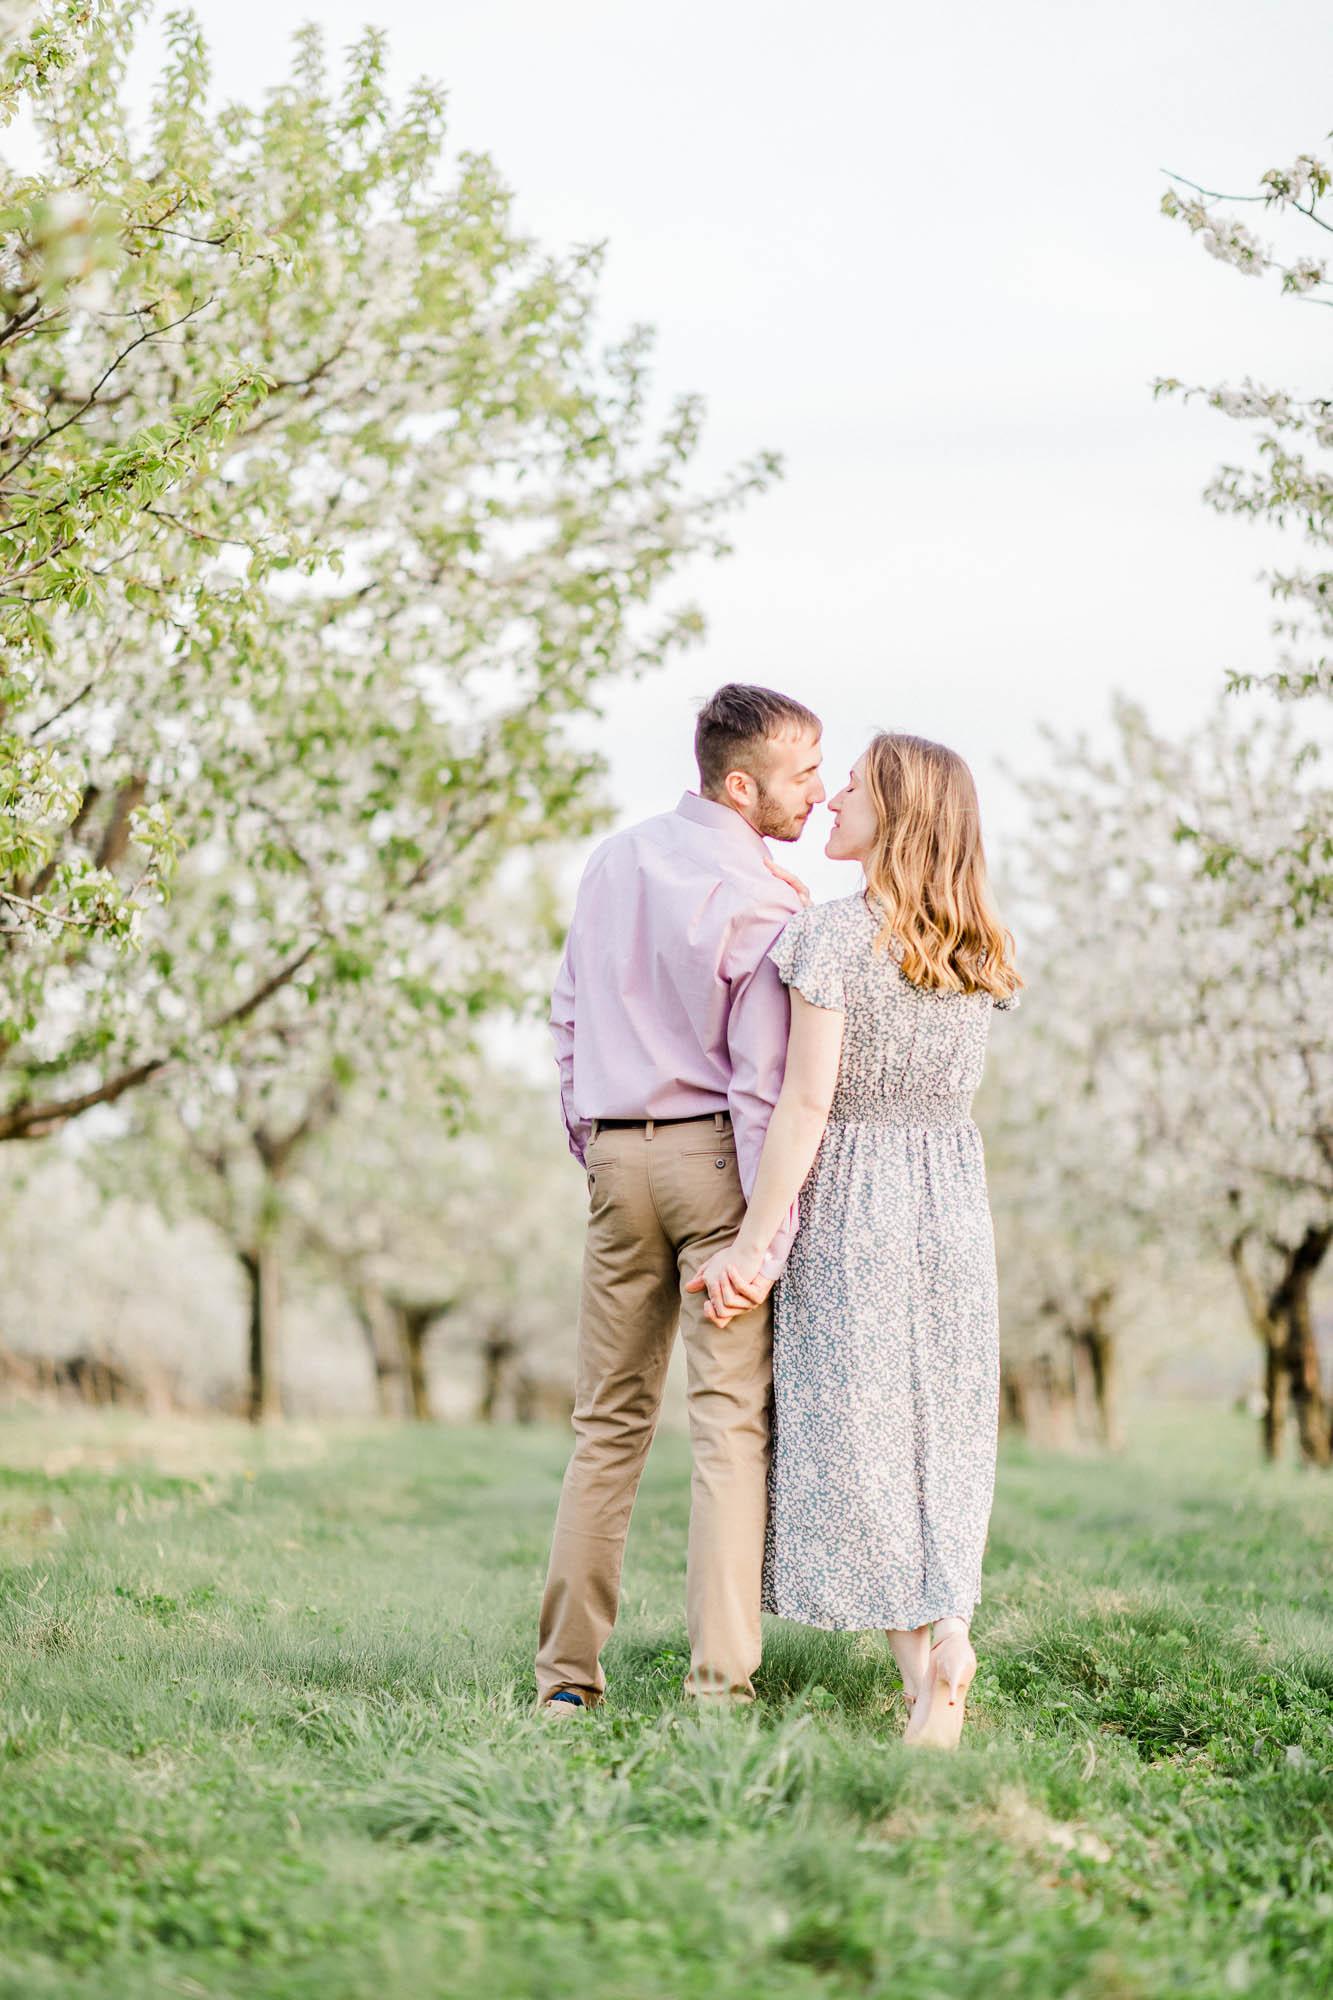 Rohrbachs-Spring-cherry-blossom-engagement-7738.jpg